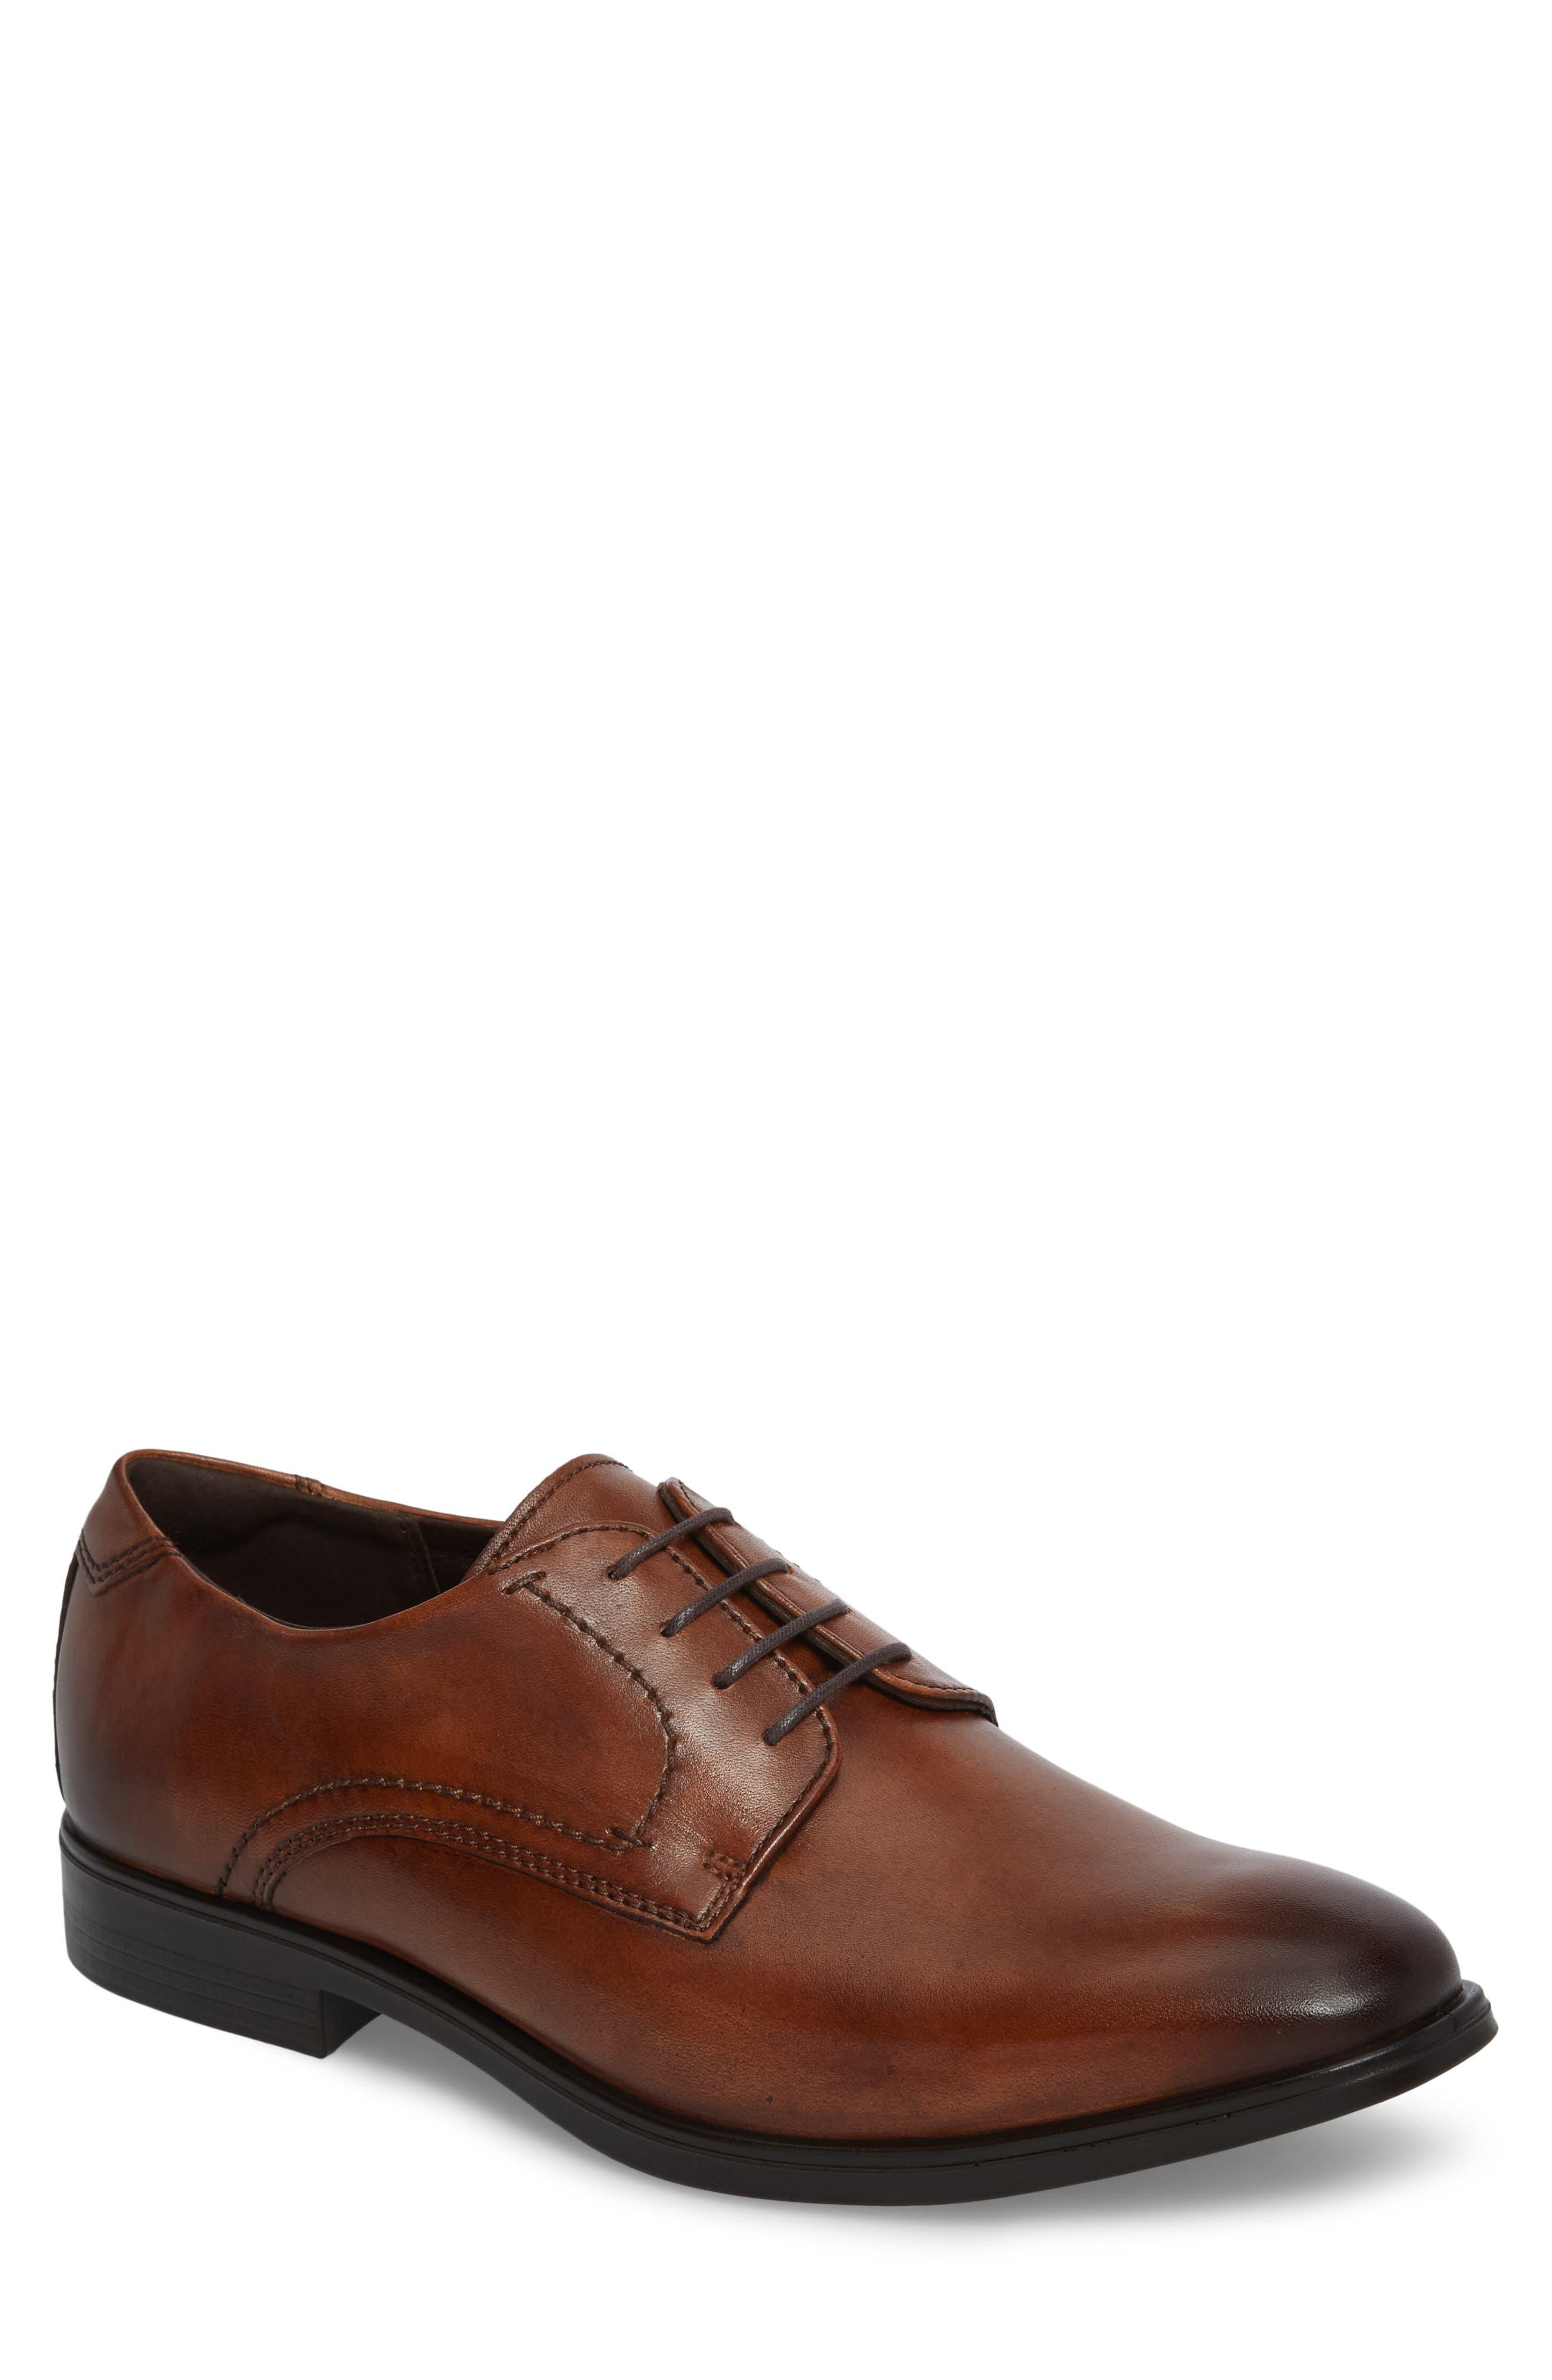 Melbourne Plain Toe Derby,                         Main,                         color, Amber Leather